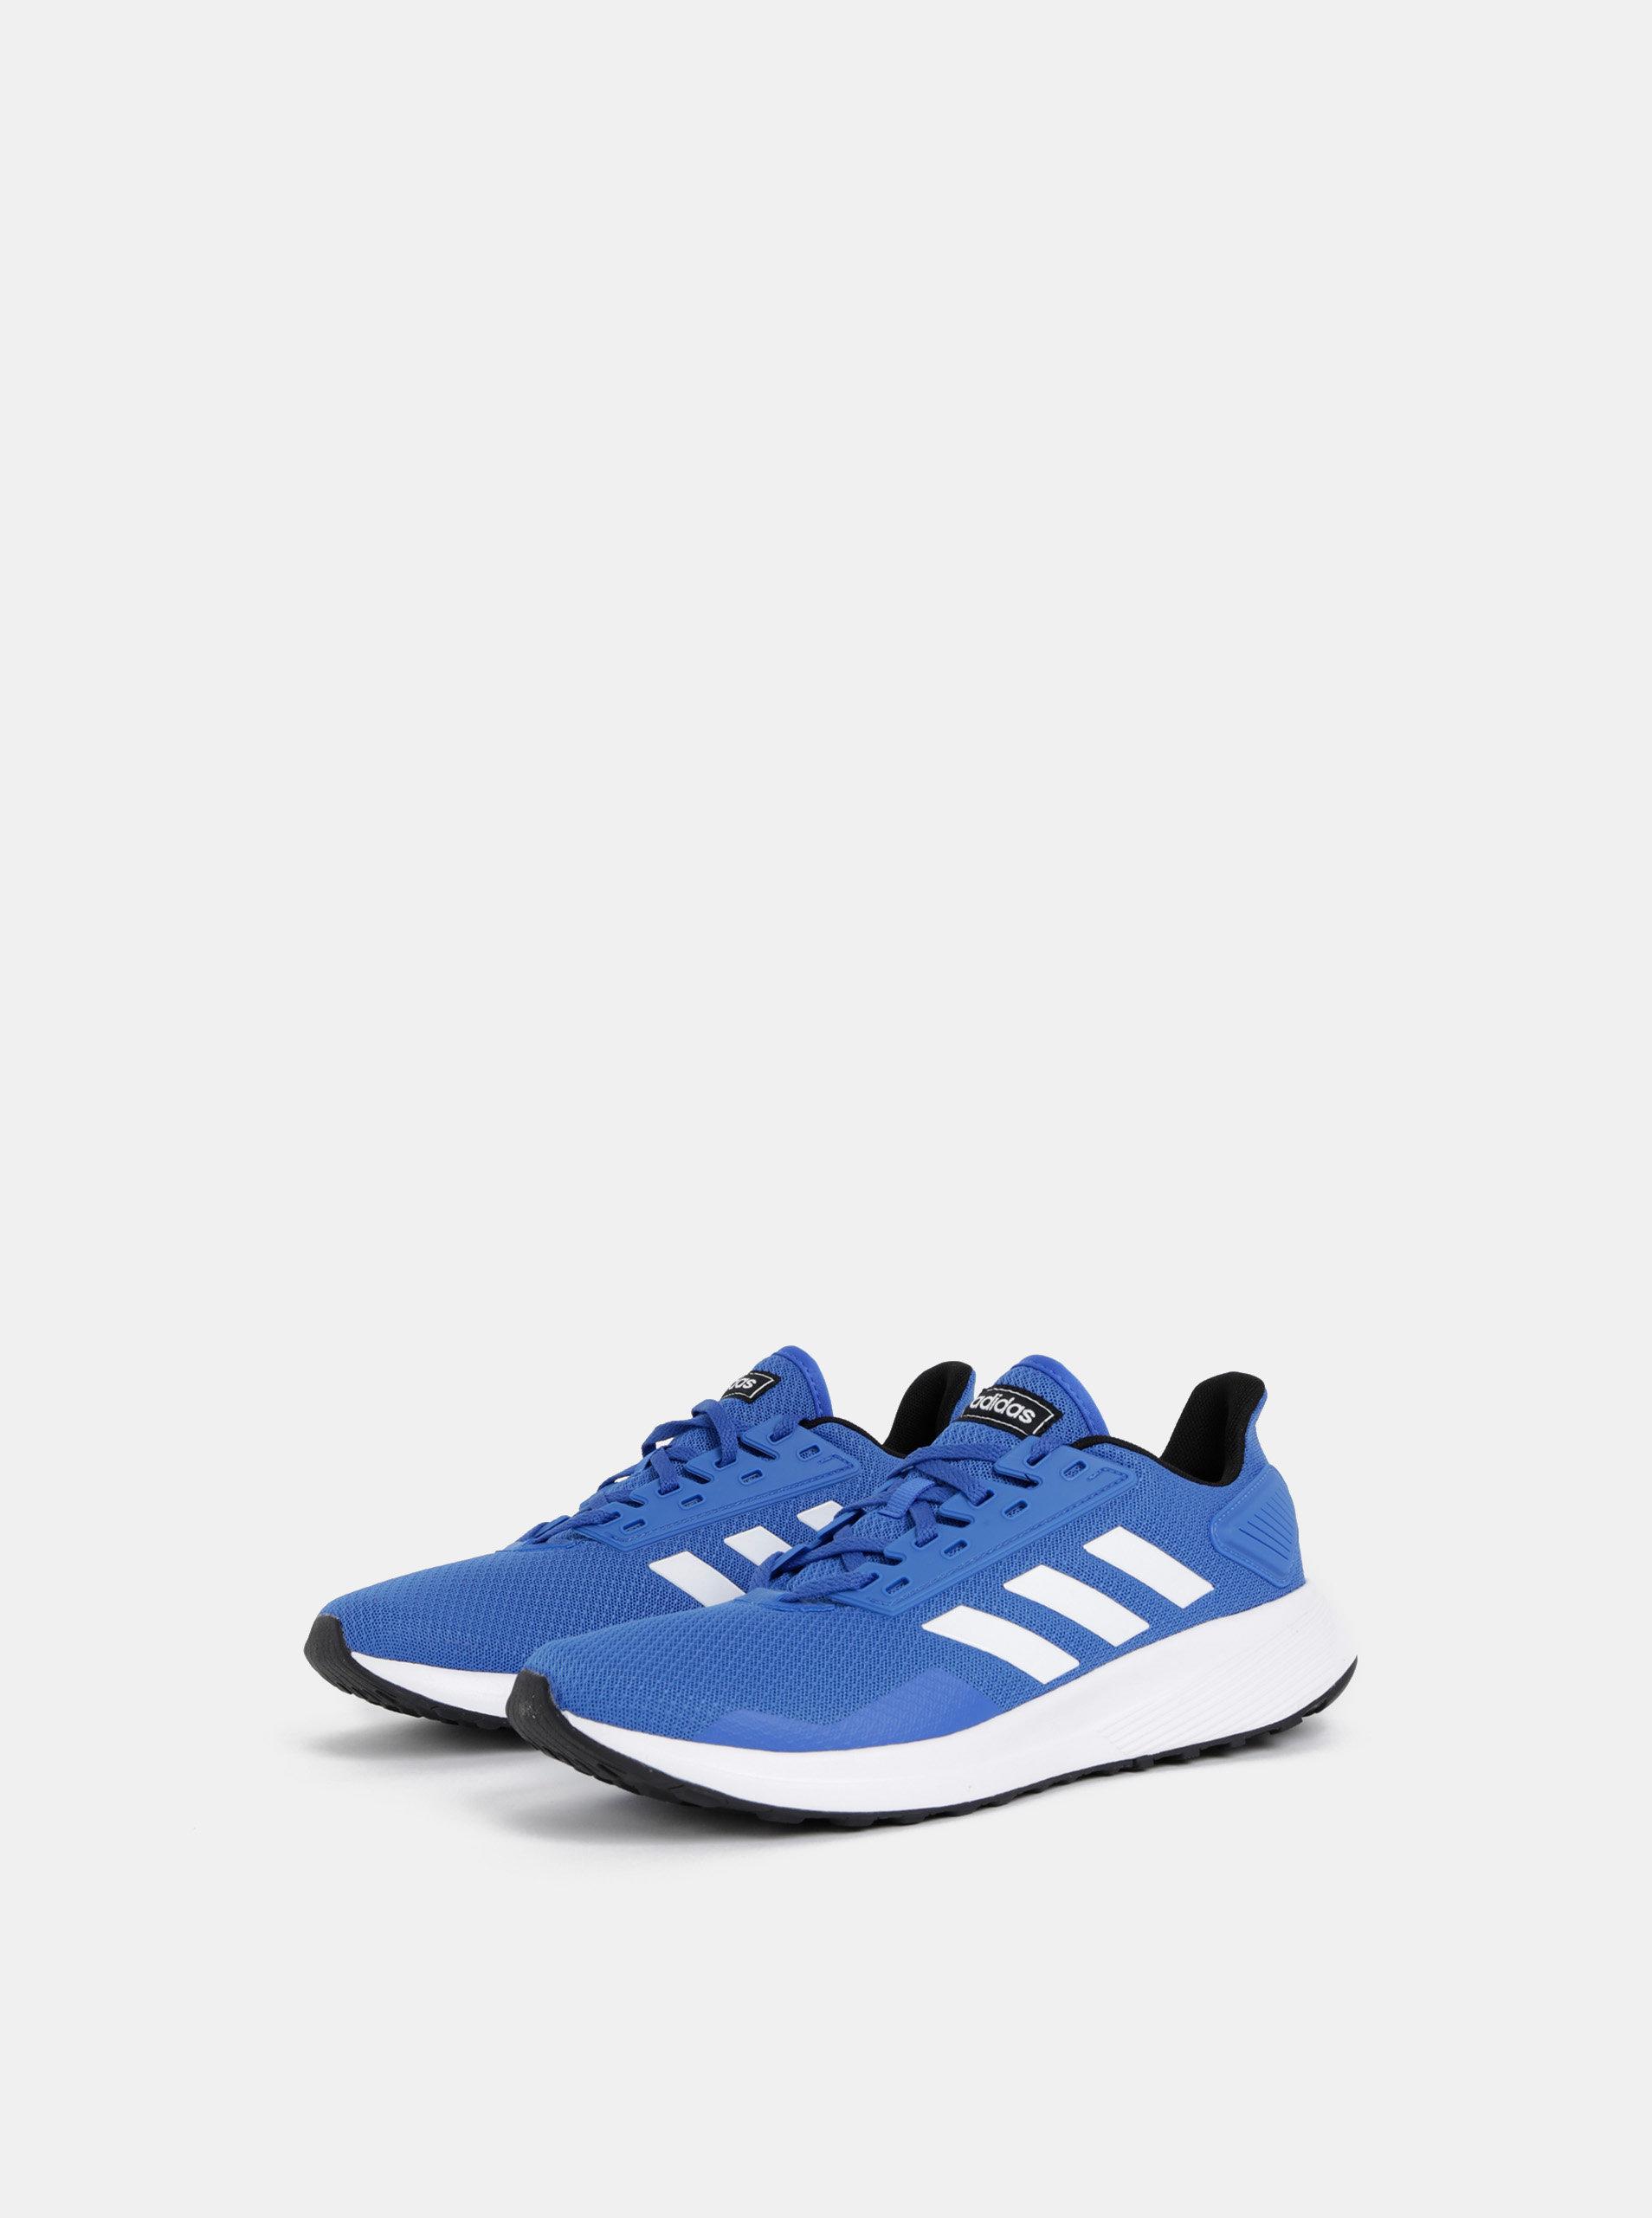 dd0d373876 Modré pánske tenisky adidas CORE Duramo 9 ...